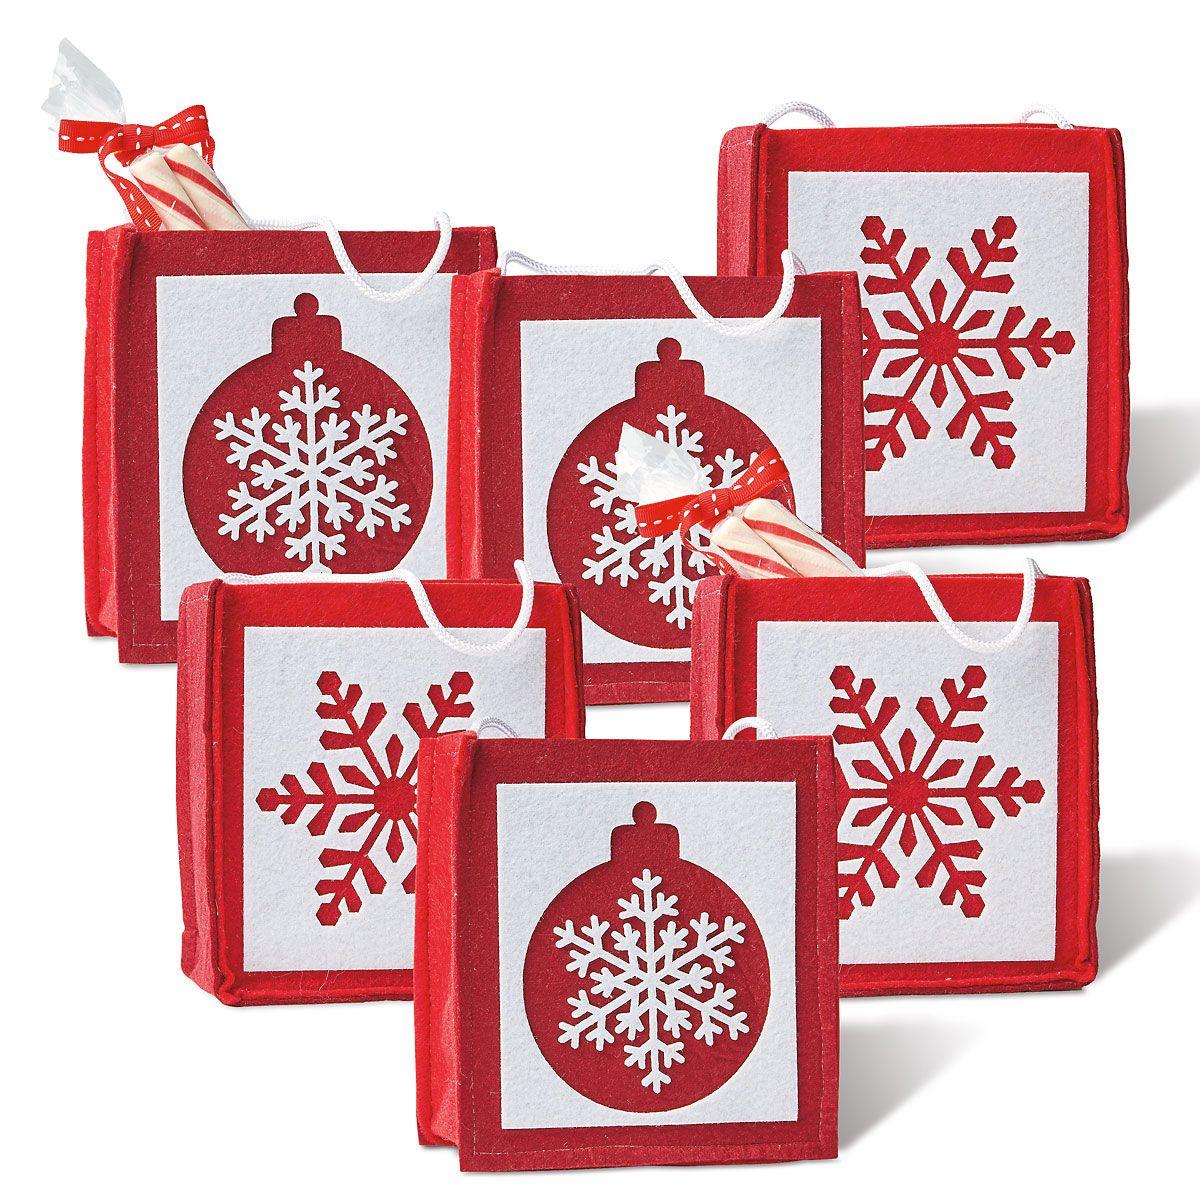 Christmas Snowflakes & Ornaments Felt Bags